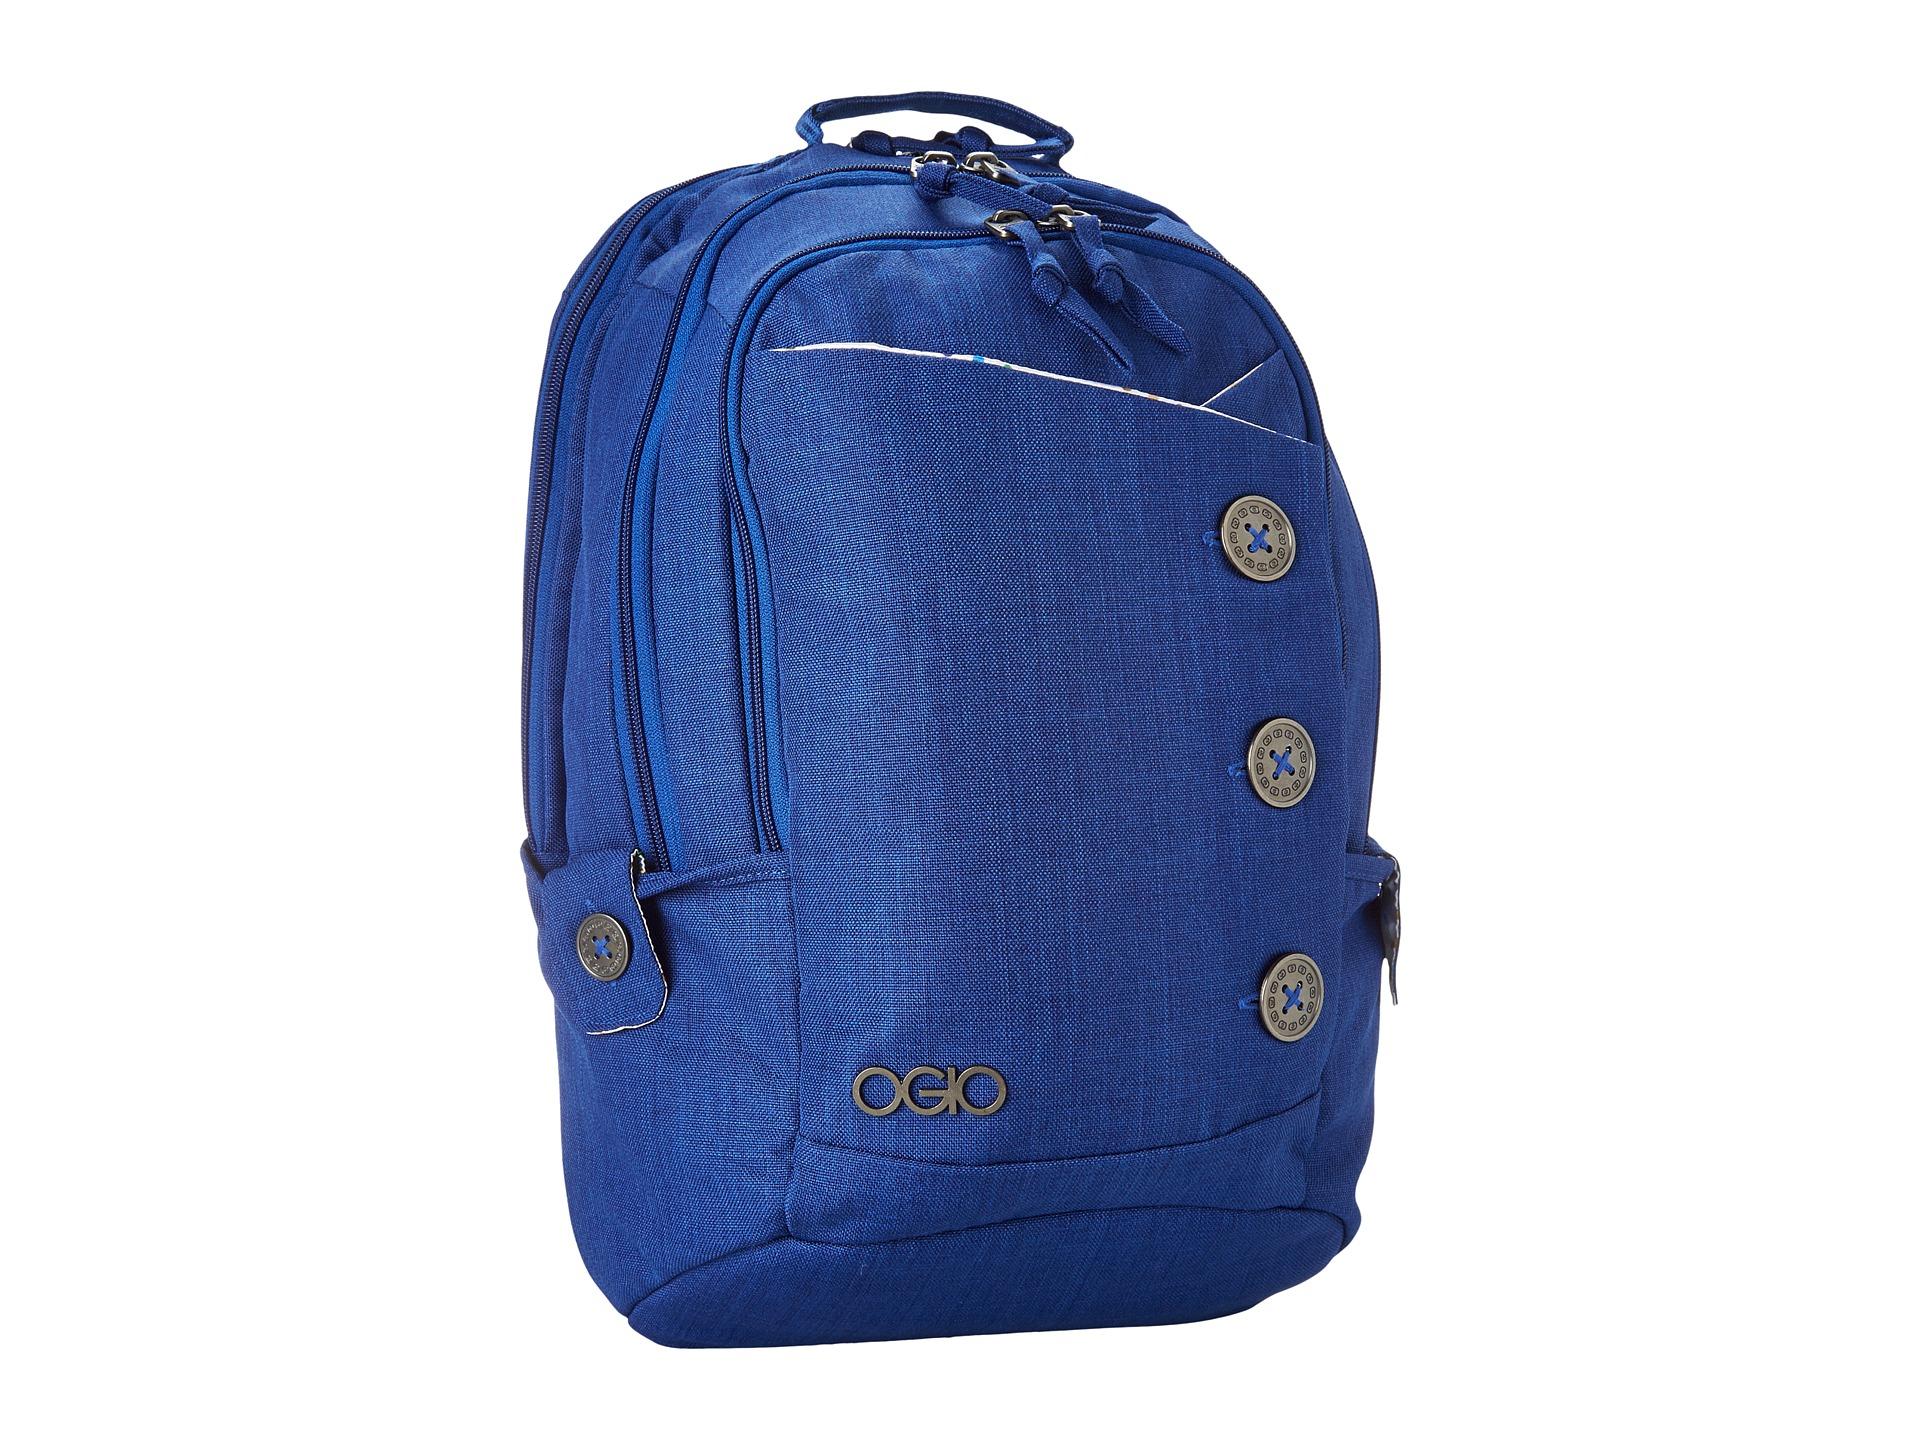 OGIO Soho Pack - Zappos.com Free Shipping BOTH Ways